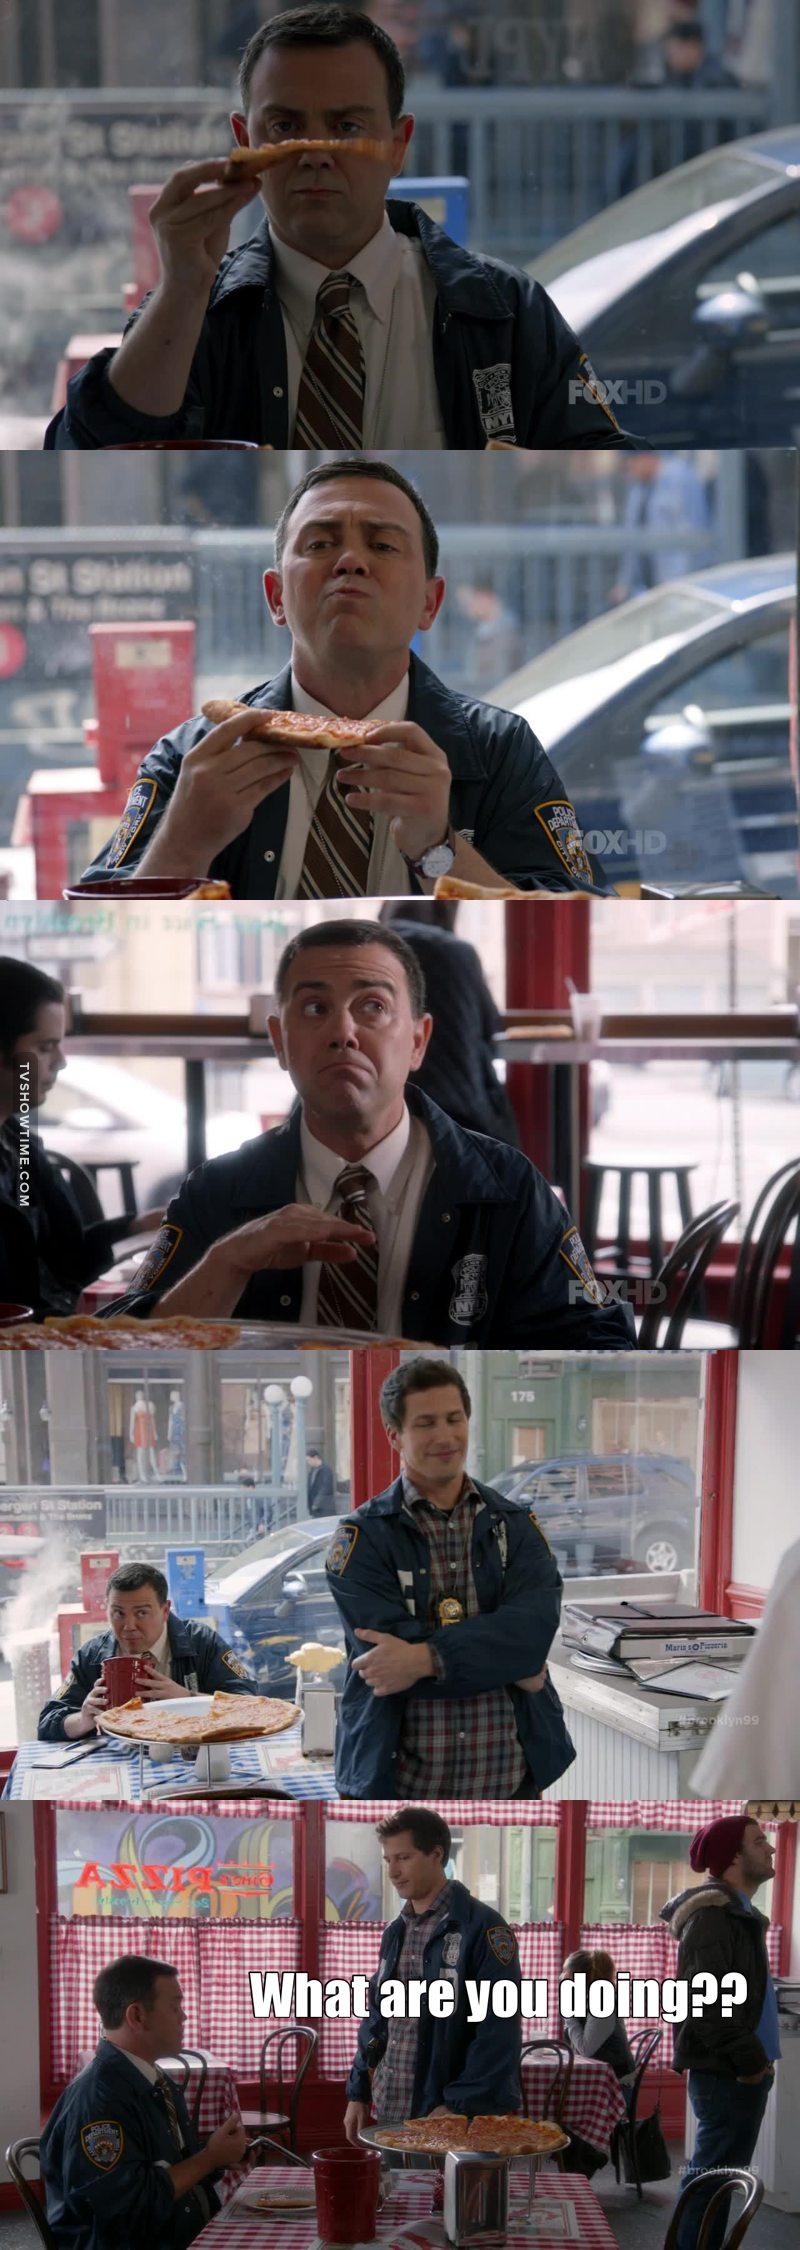 Boyle pizza's assayer... Damn, I want this job!!